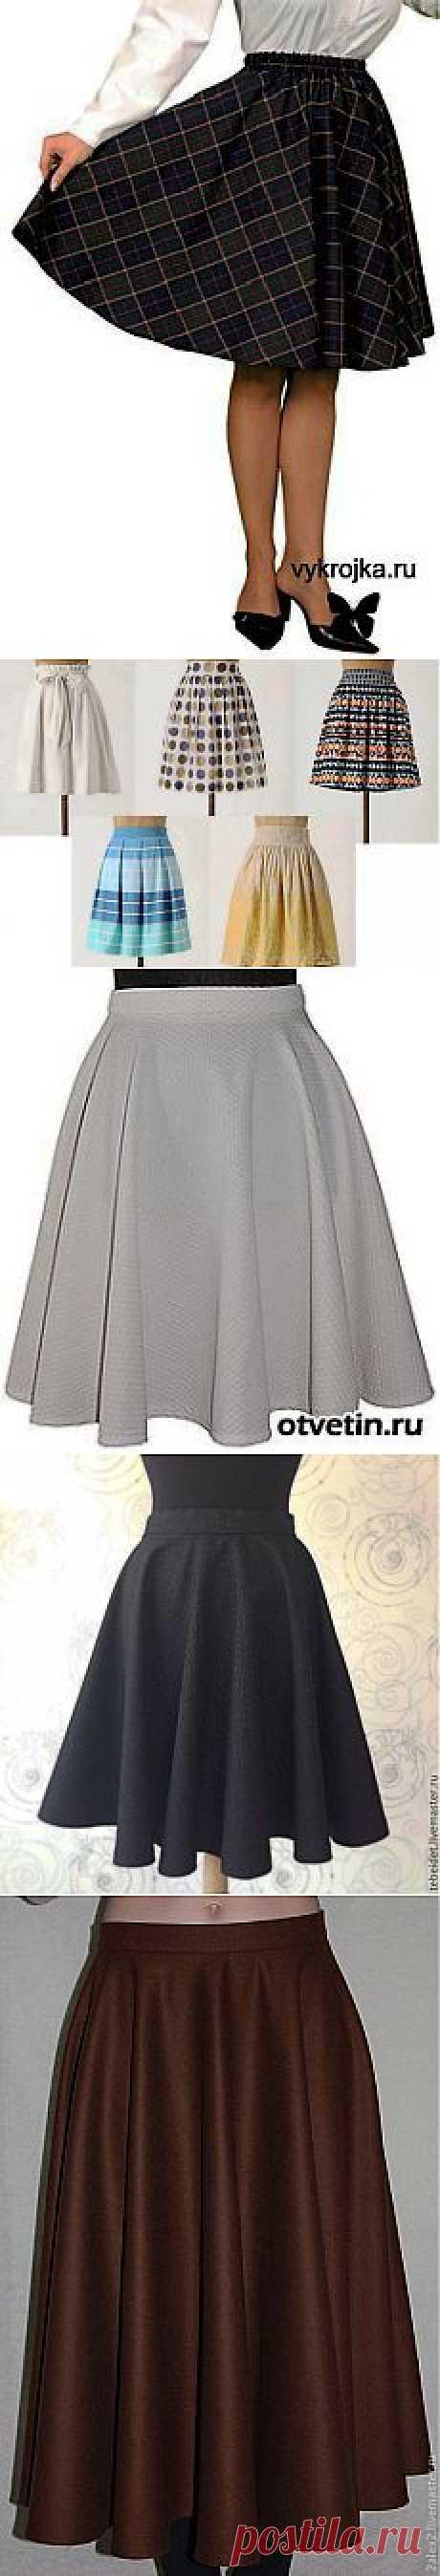 Шьем юбку-, юбку-полусолнце | Подружки